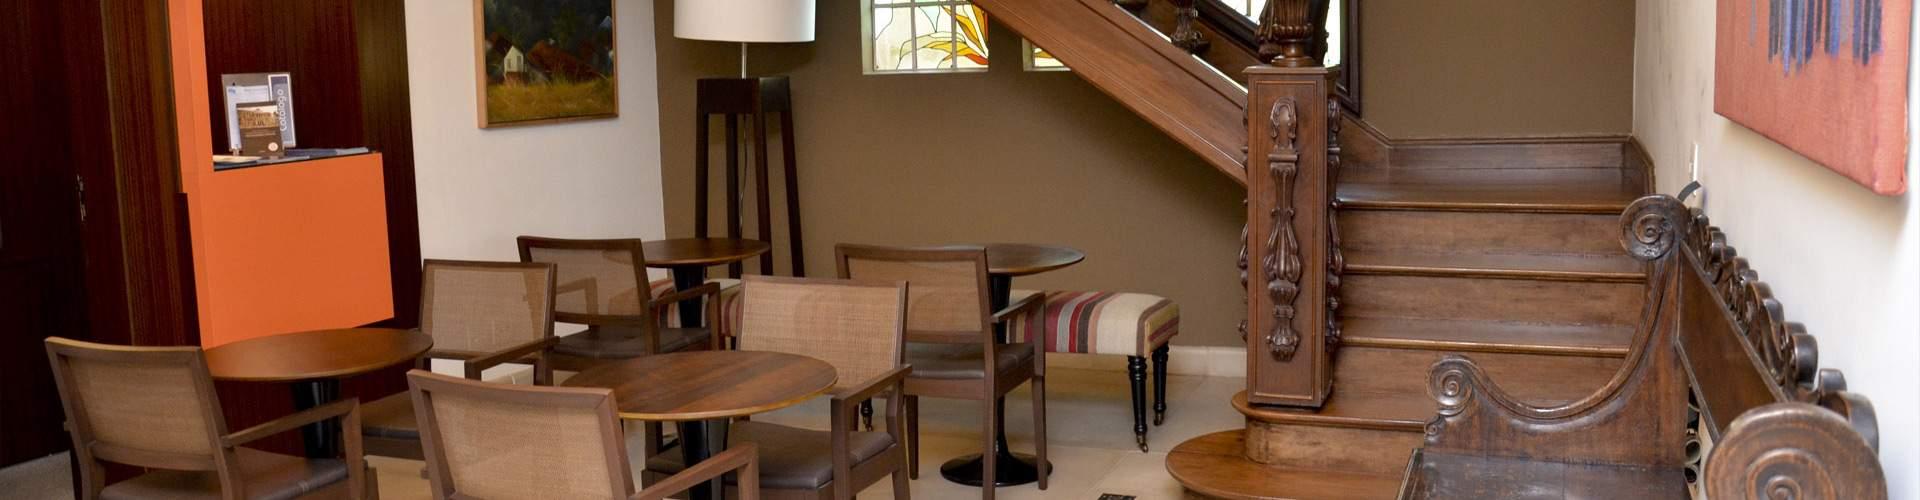 ibet-sao-paulo-home-escada